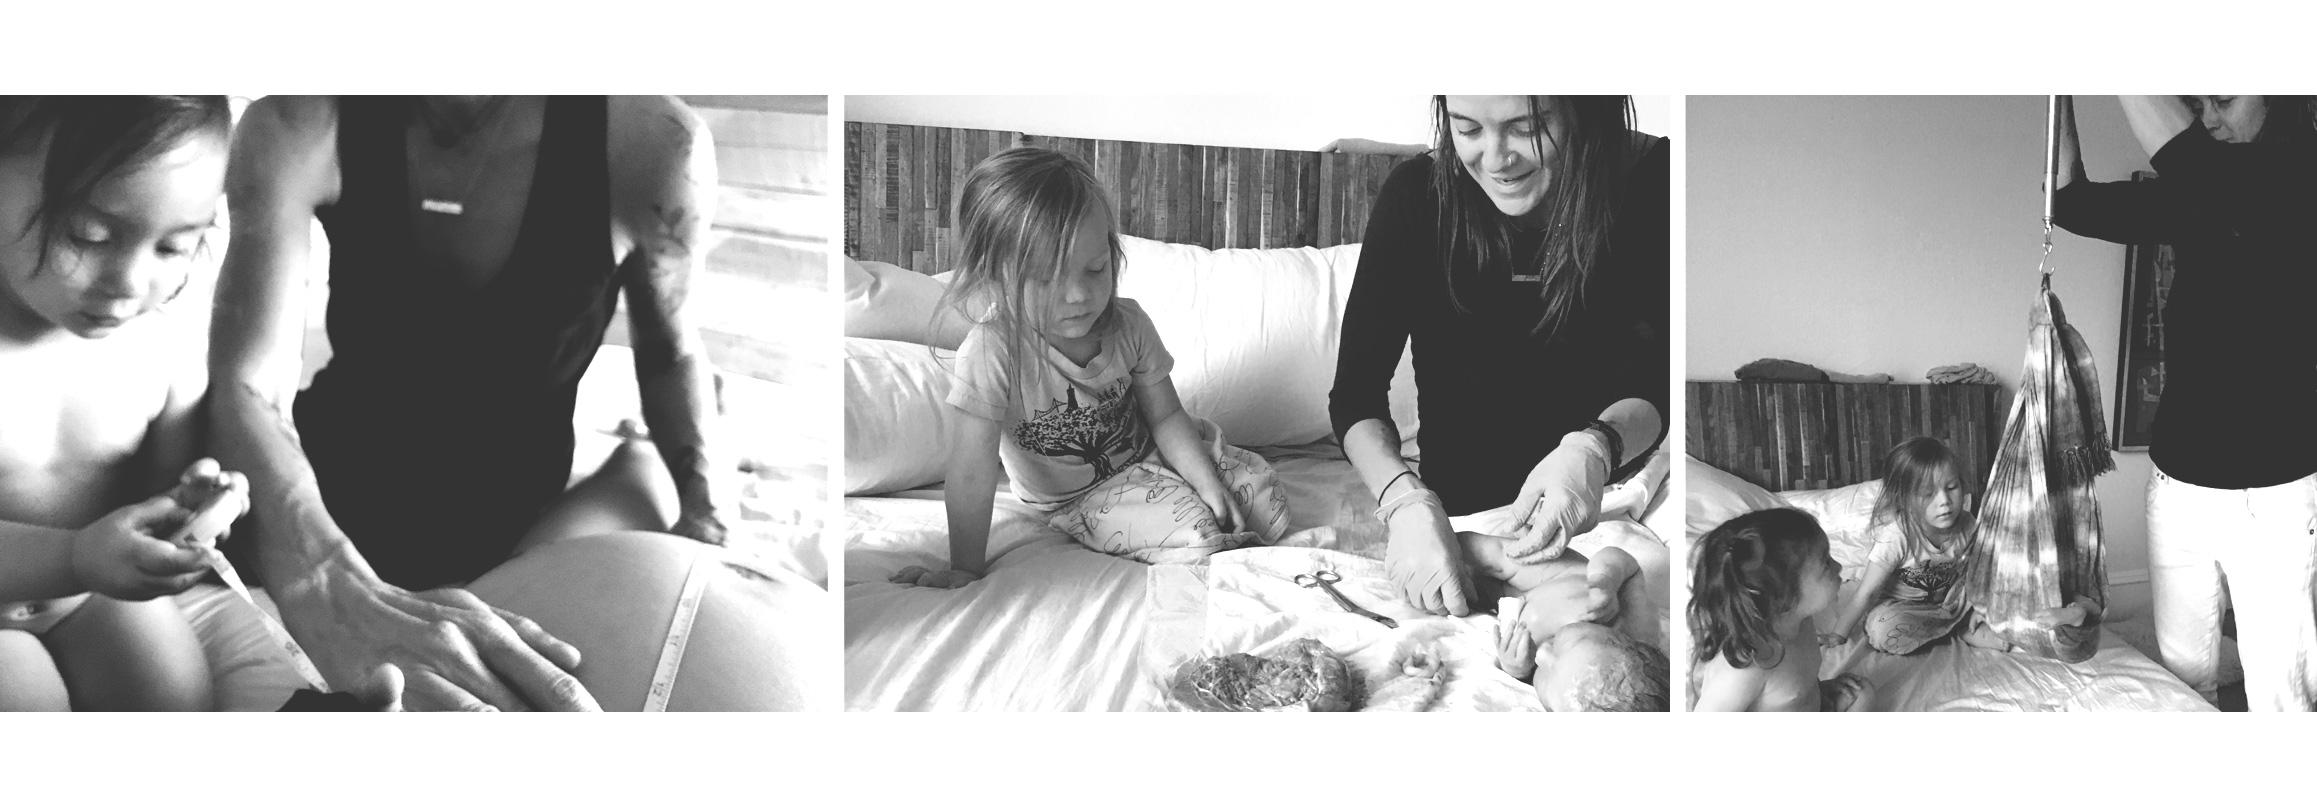 women-born-kelly-murphy-midwife-sanfrancisco-home-image-9.jpg